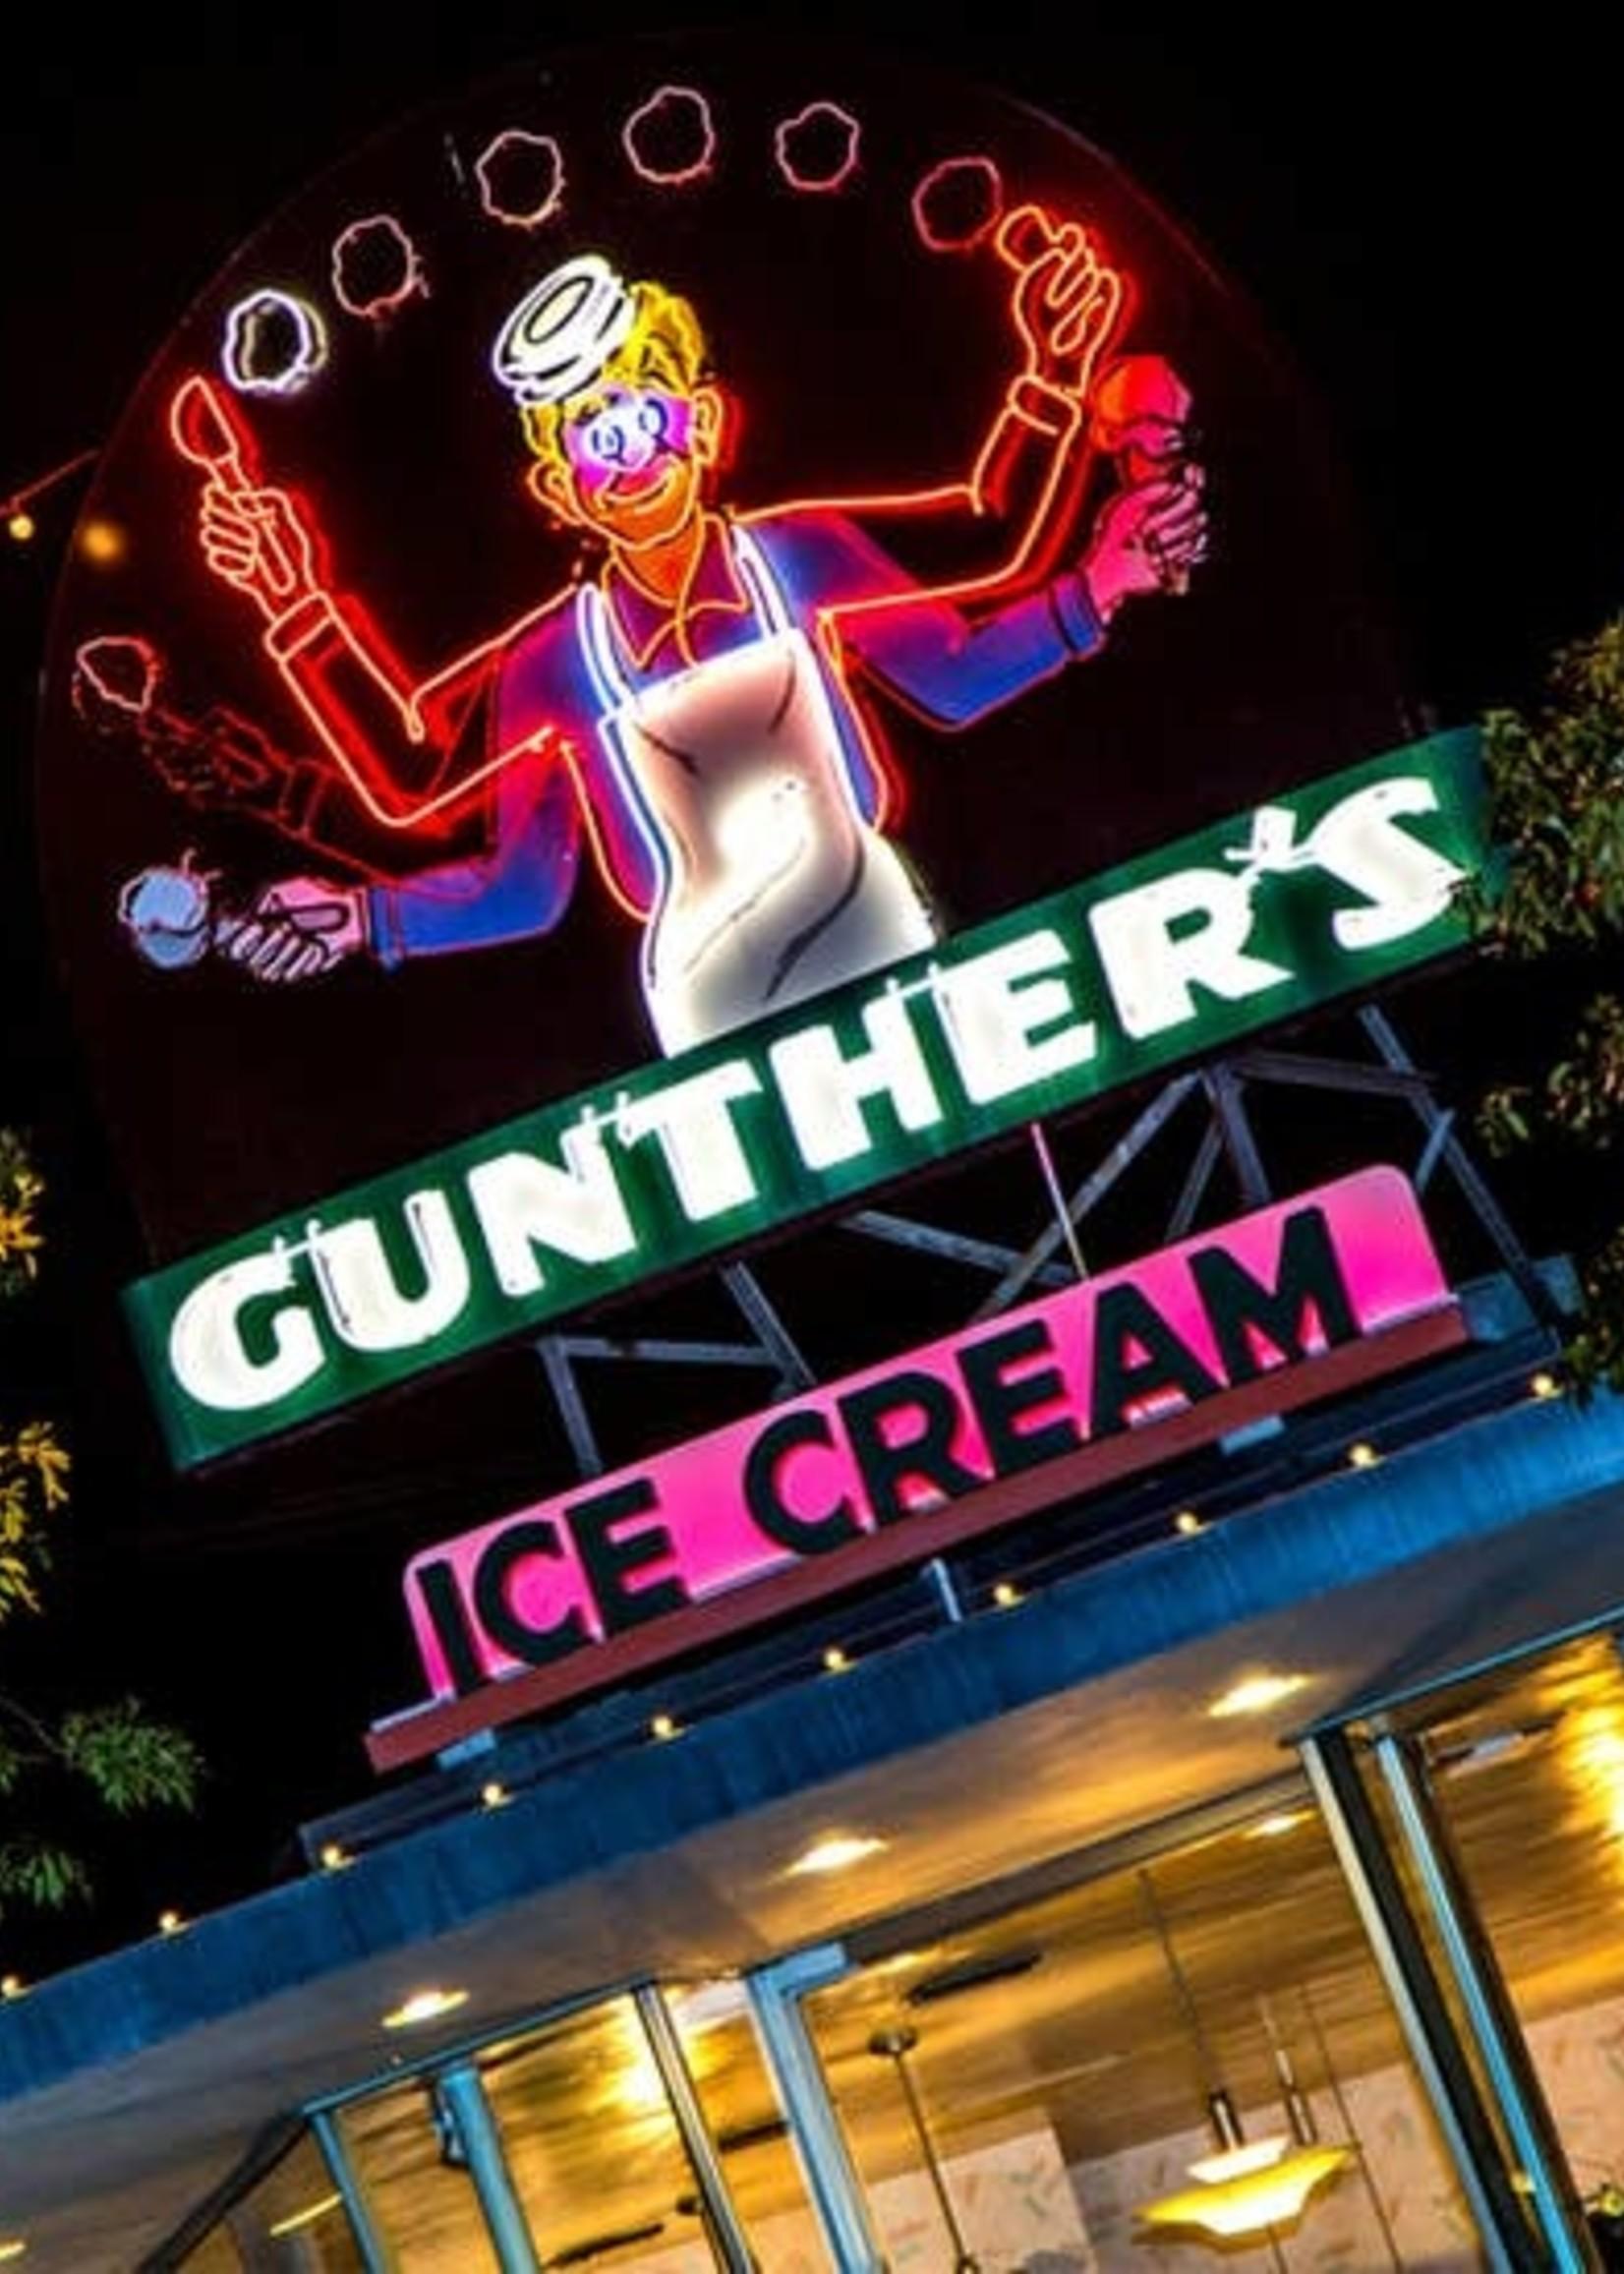 SOUTH AUSTIN GALLERY SAC GUNTHER'S ICE CREAM CERAMIC TILE COASTER